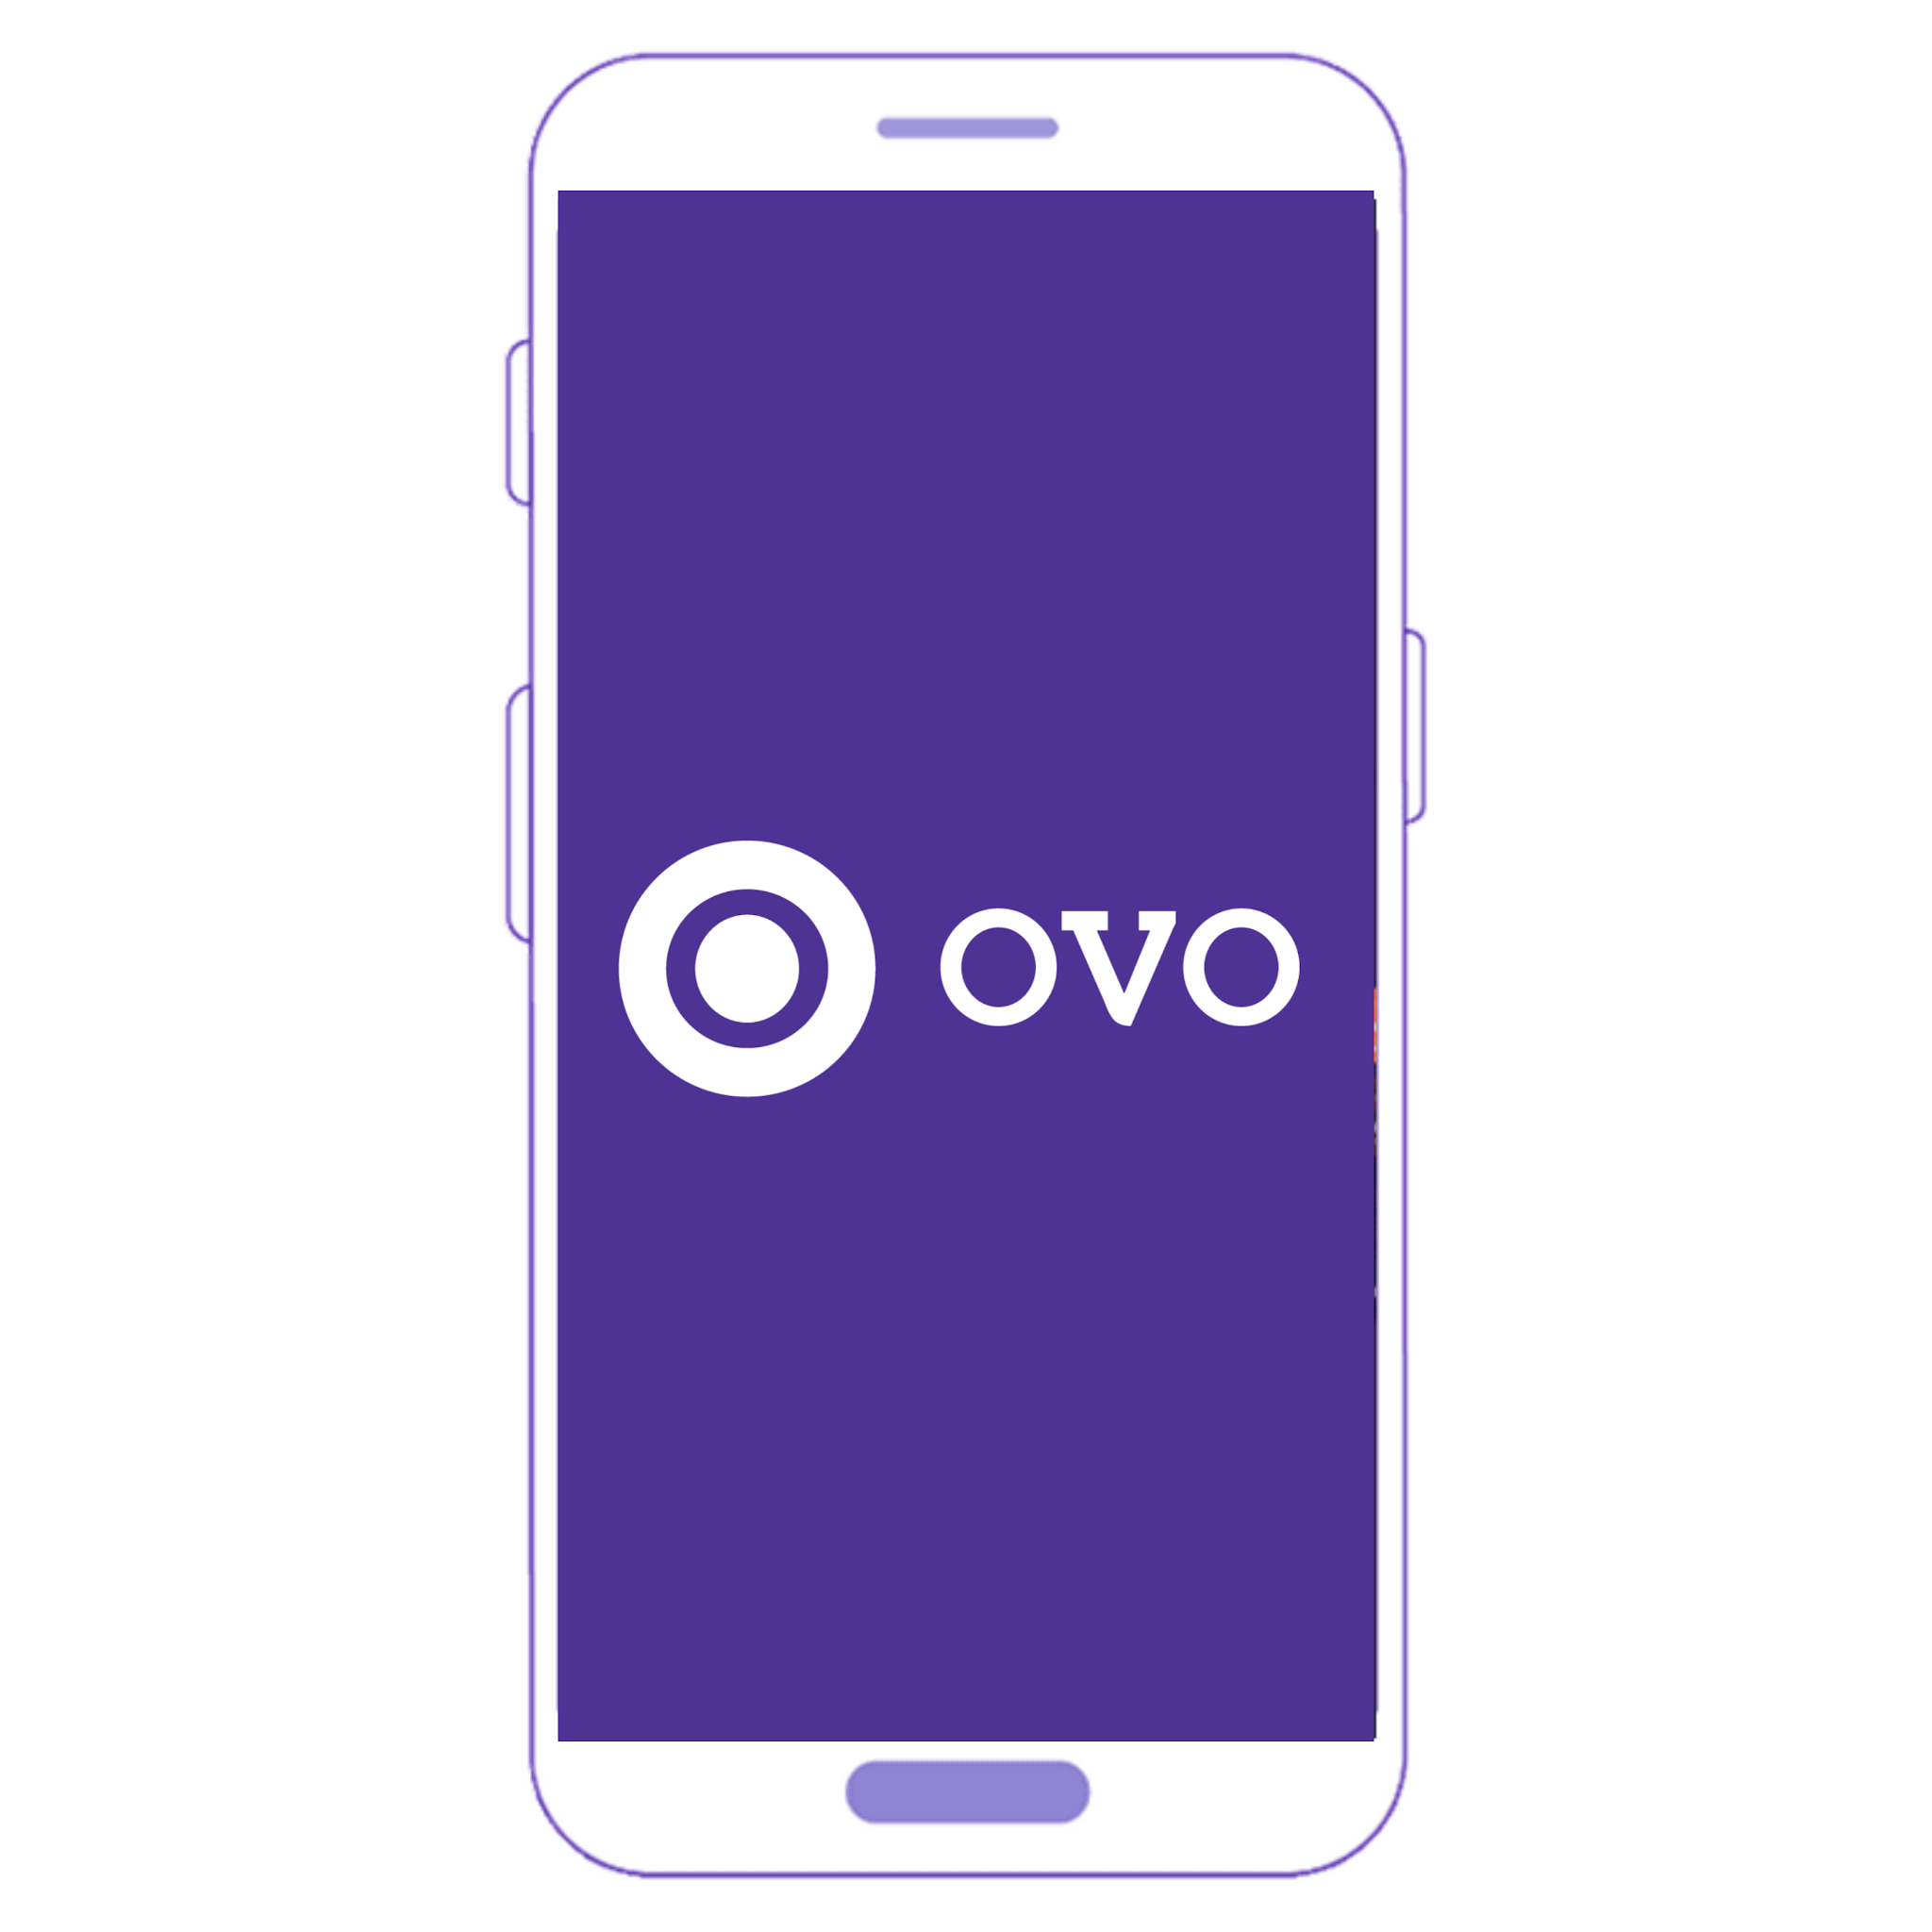 Cara Transfer Saldo OVO ke Rekening Bank